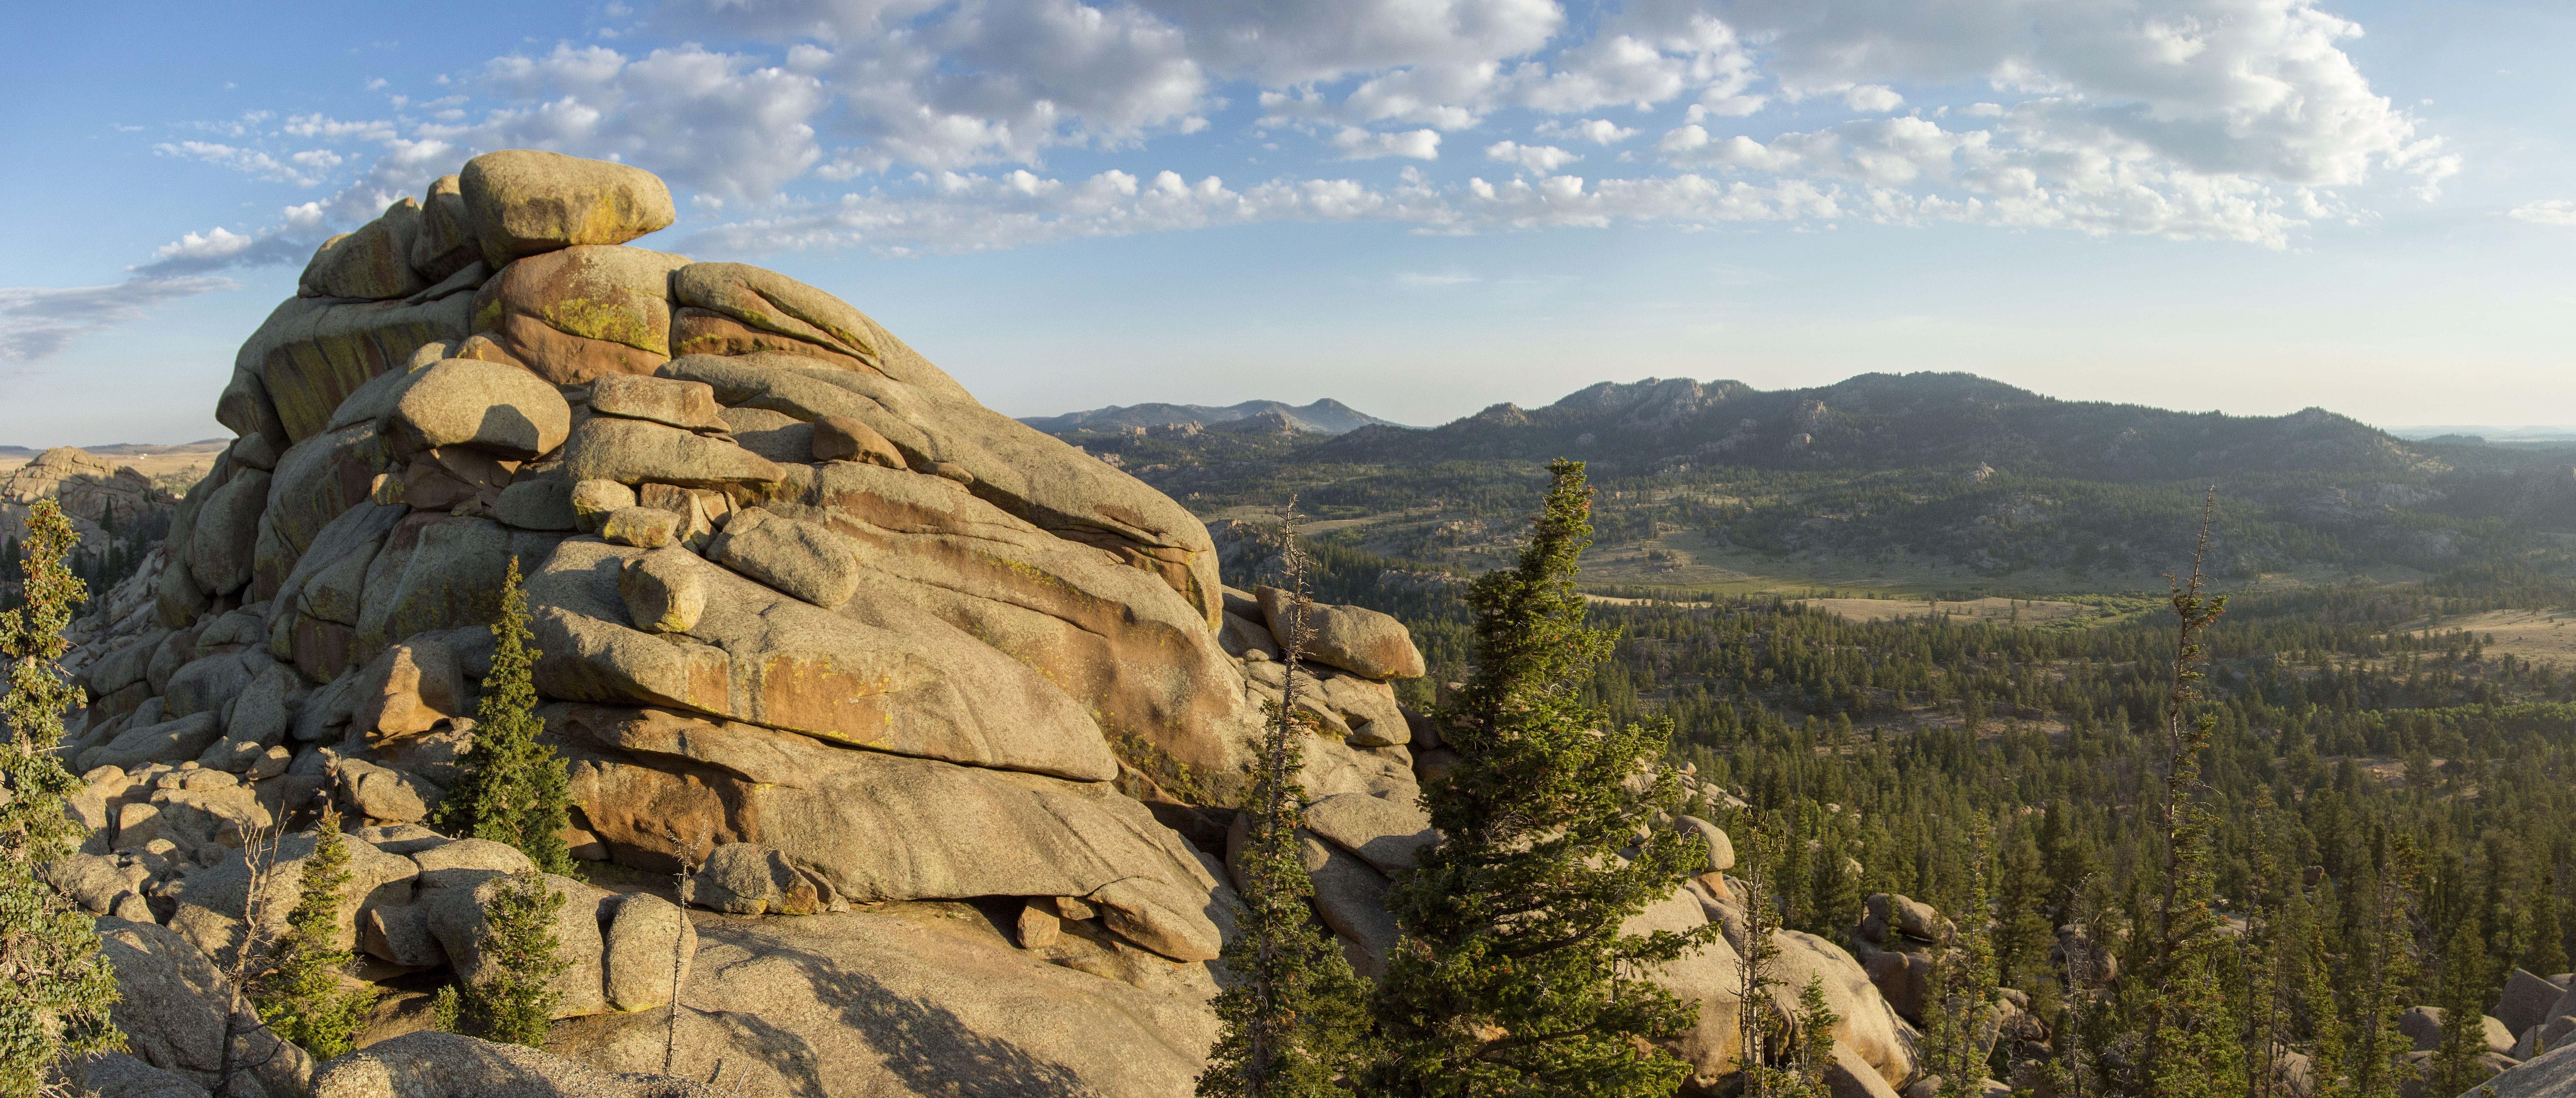 Medicine Bow Peak hiking trail is a locals favorite